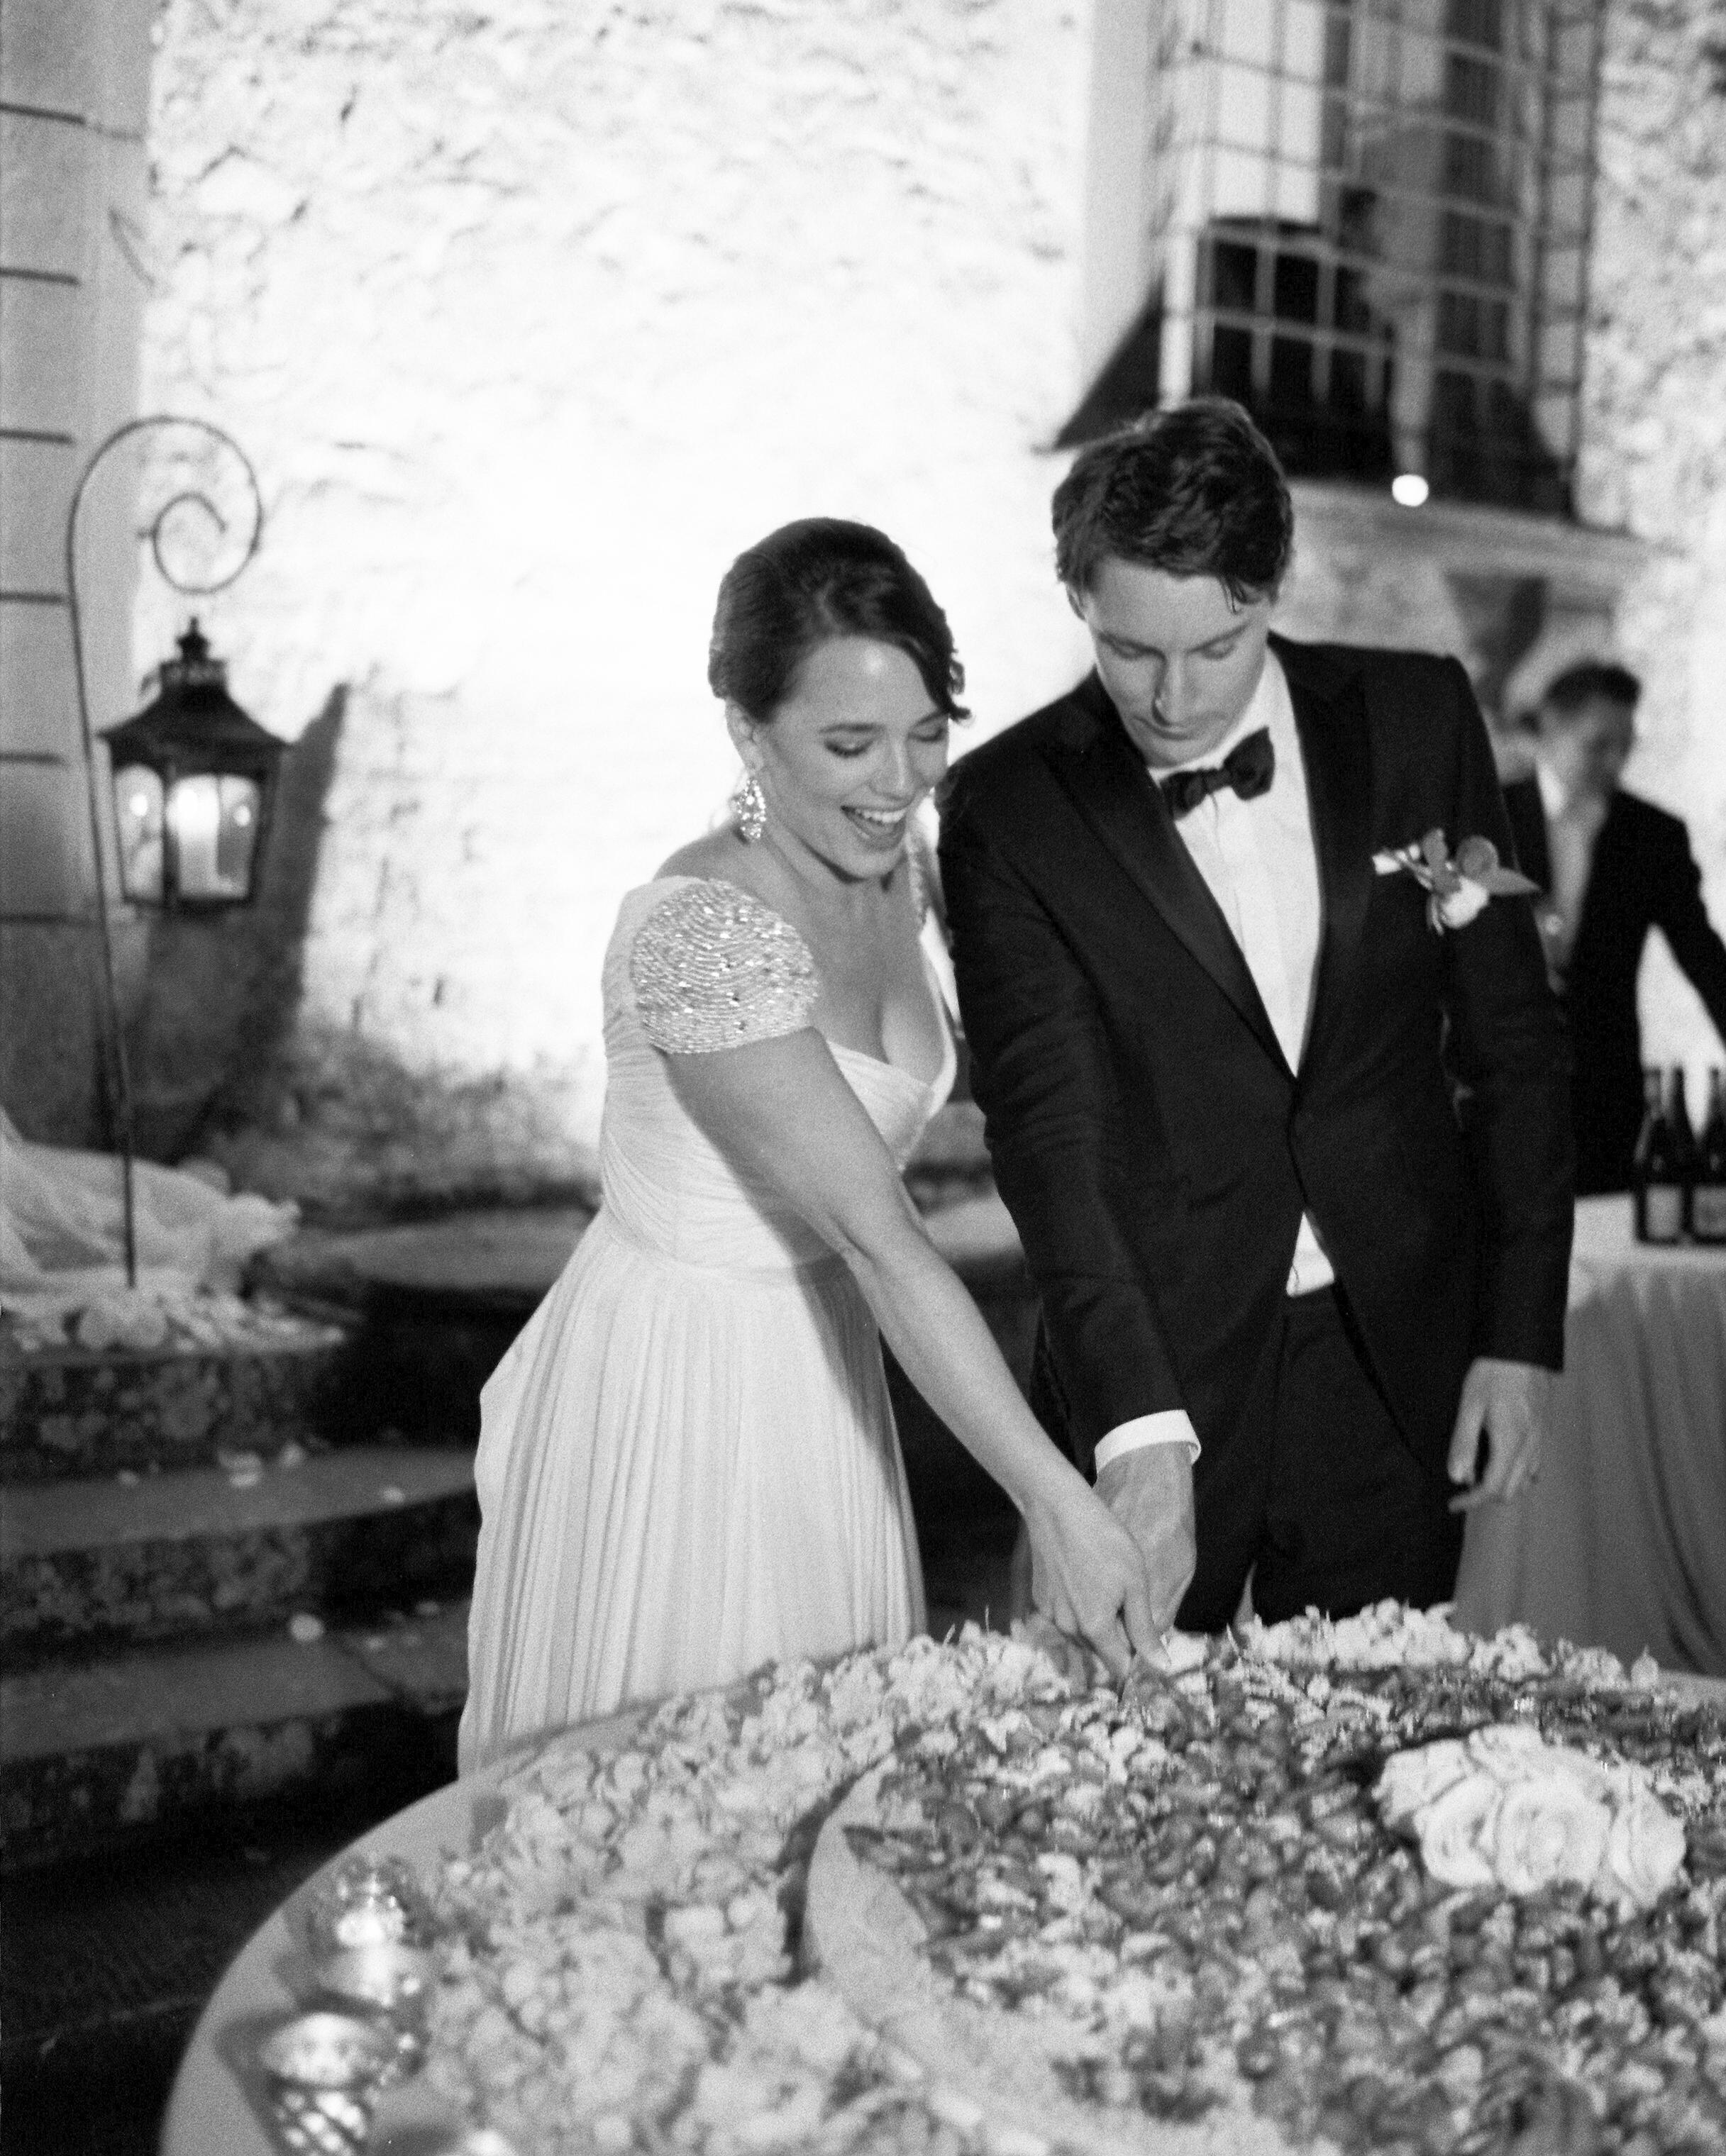 lauren-ollie-wedding-cake-612-s111895-0515.jpg